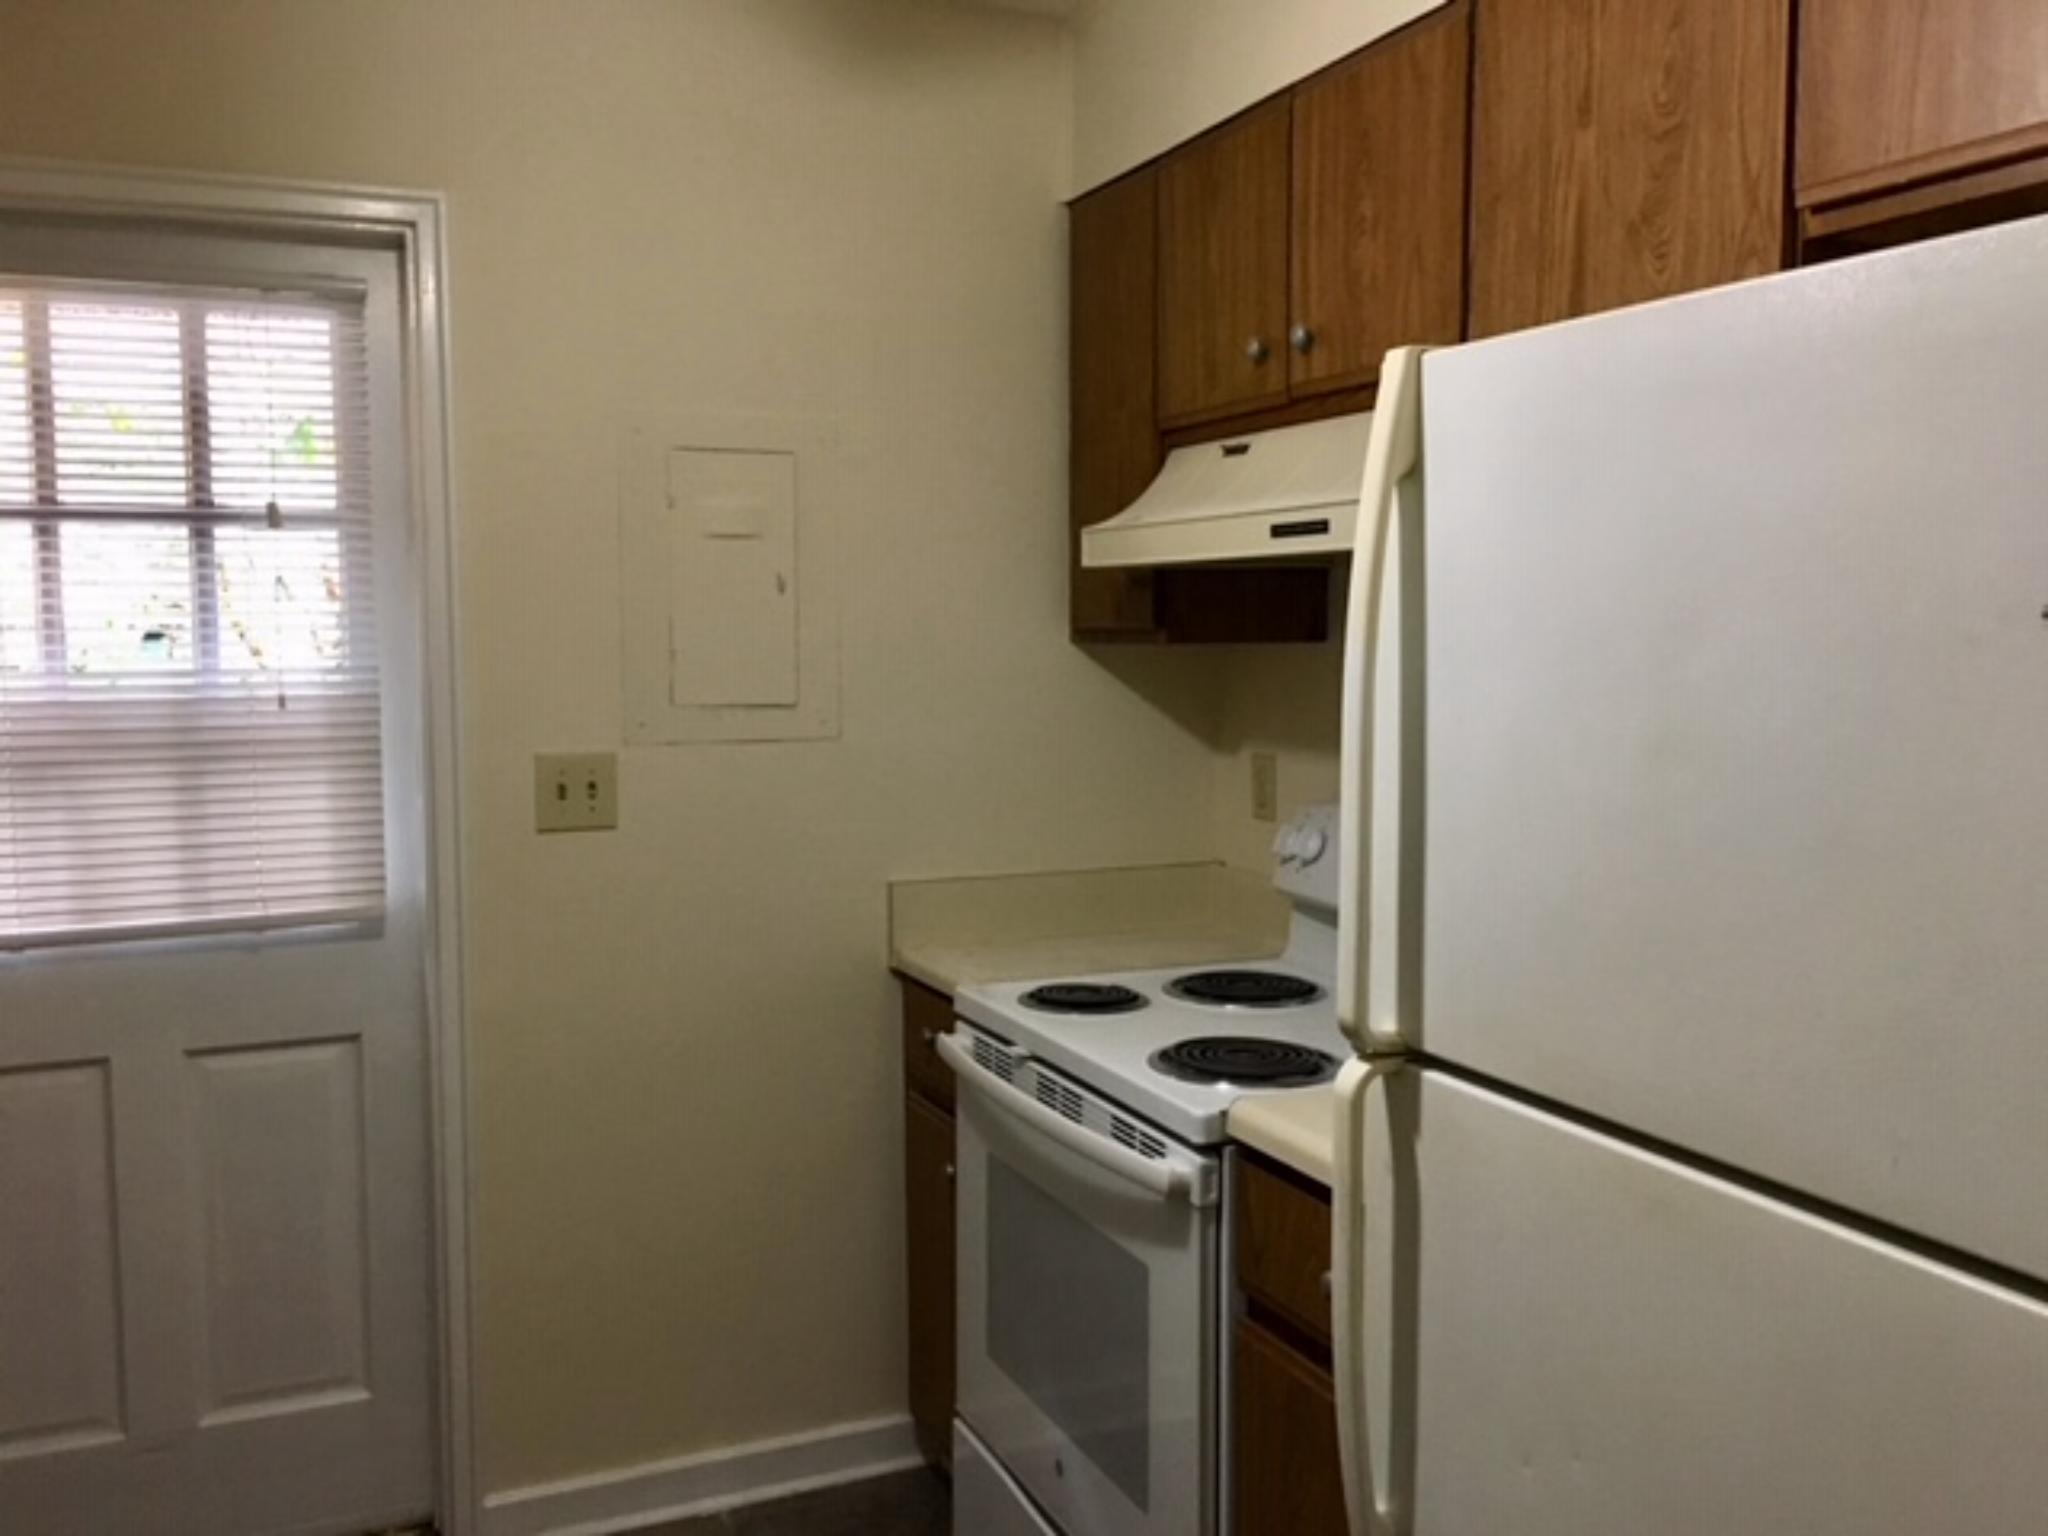 Rutledge Green Homes For Sale - 173 Rutledge Ave, Charleston, SC - 15